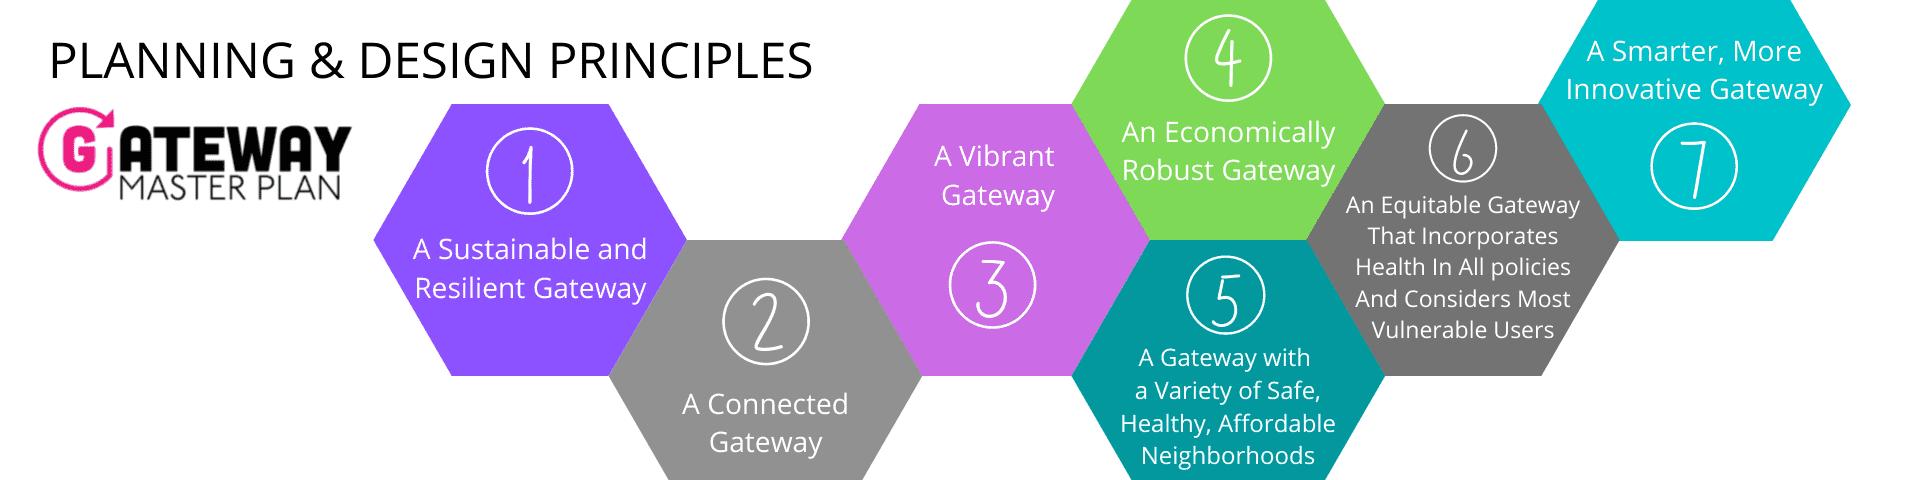 planning design principles